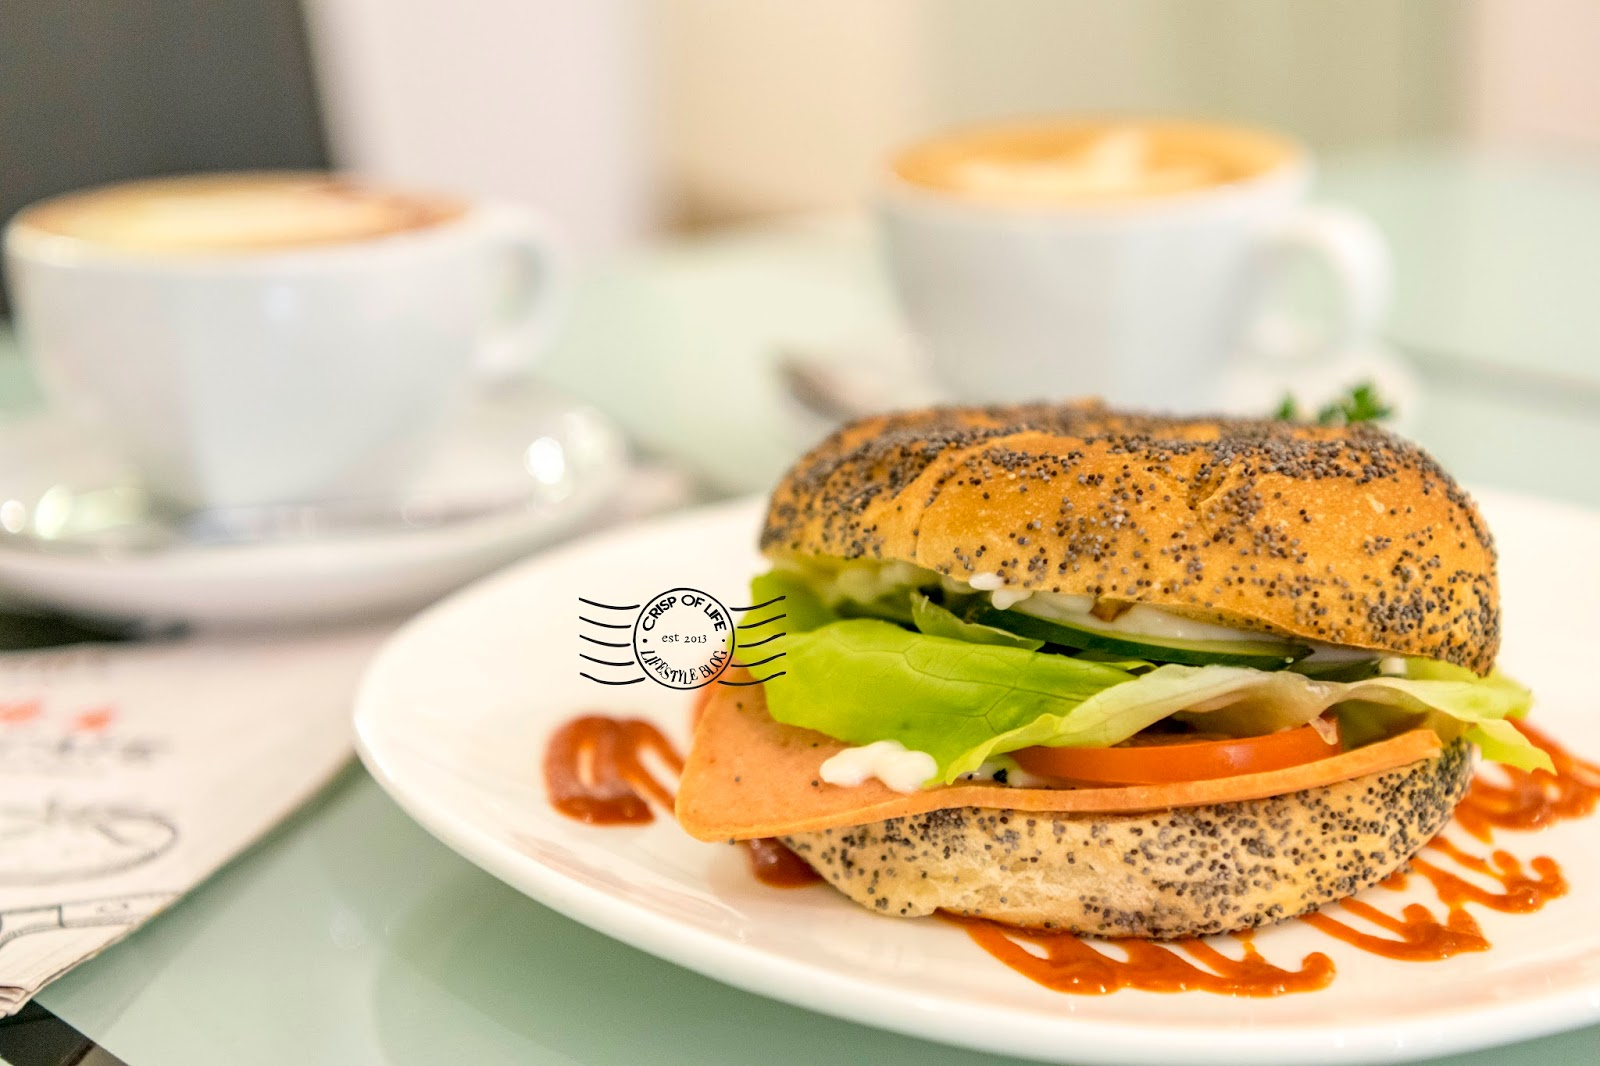 Small World 88 Cafe 88小小世界咖啡屋 Alor Setar, Kedah